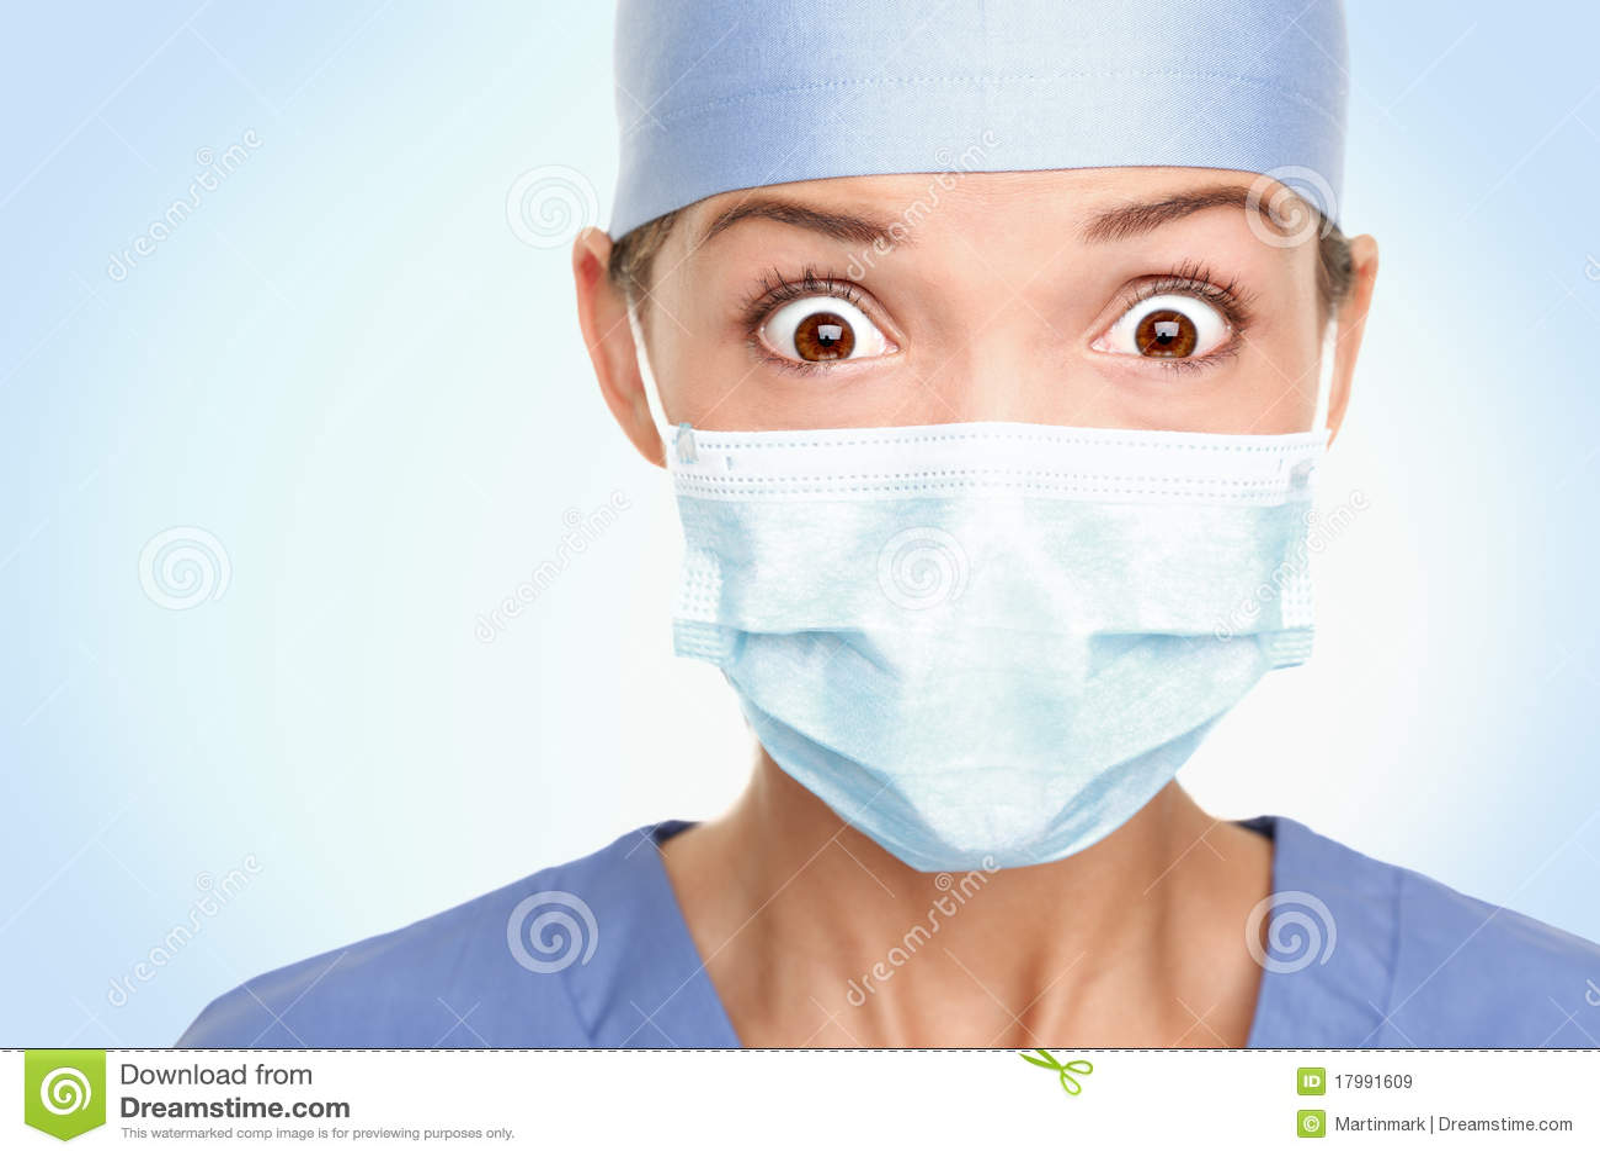 Doctor surgeon woman shocked